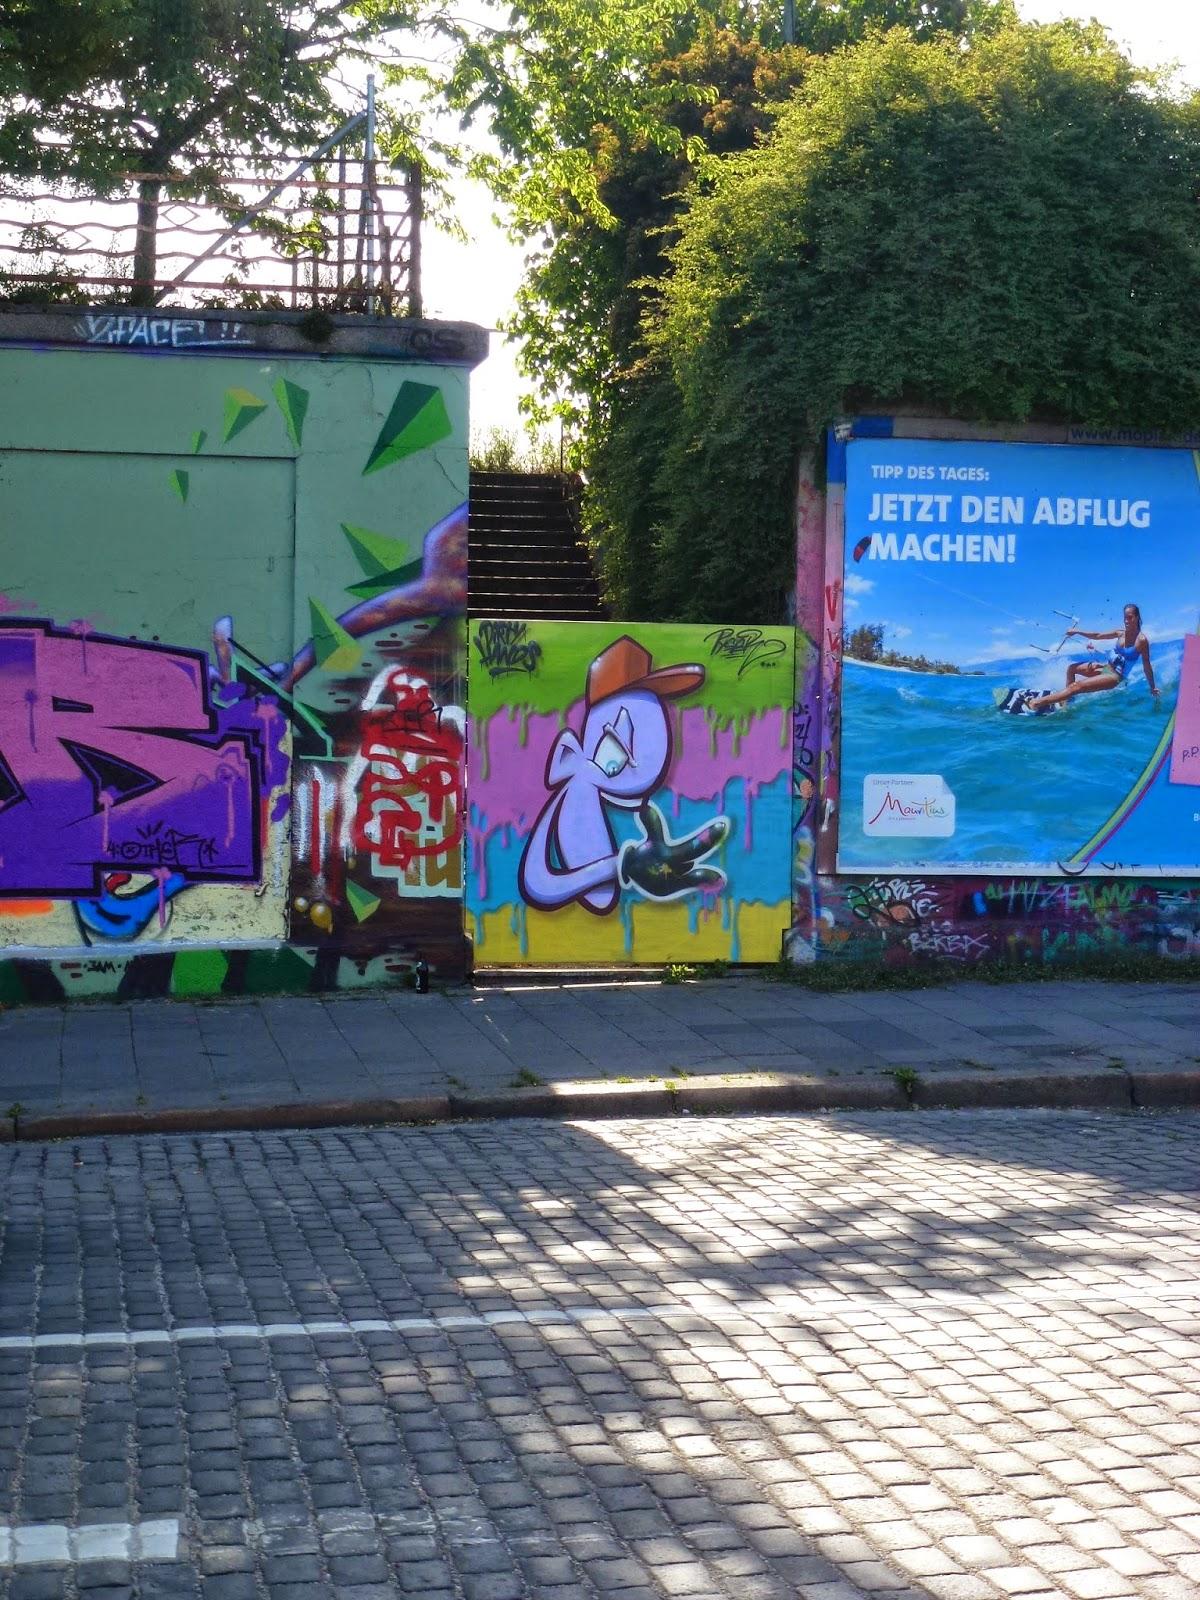 Graffiti, Streetart, Tumblingersraßet